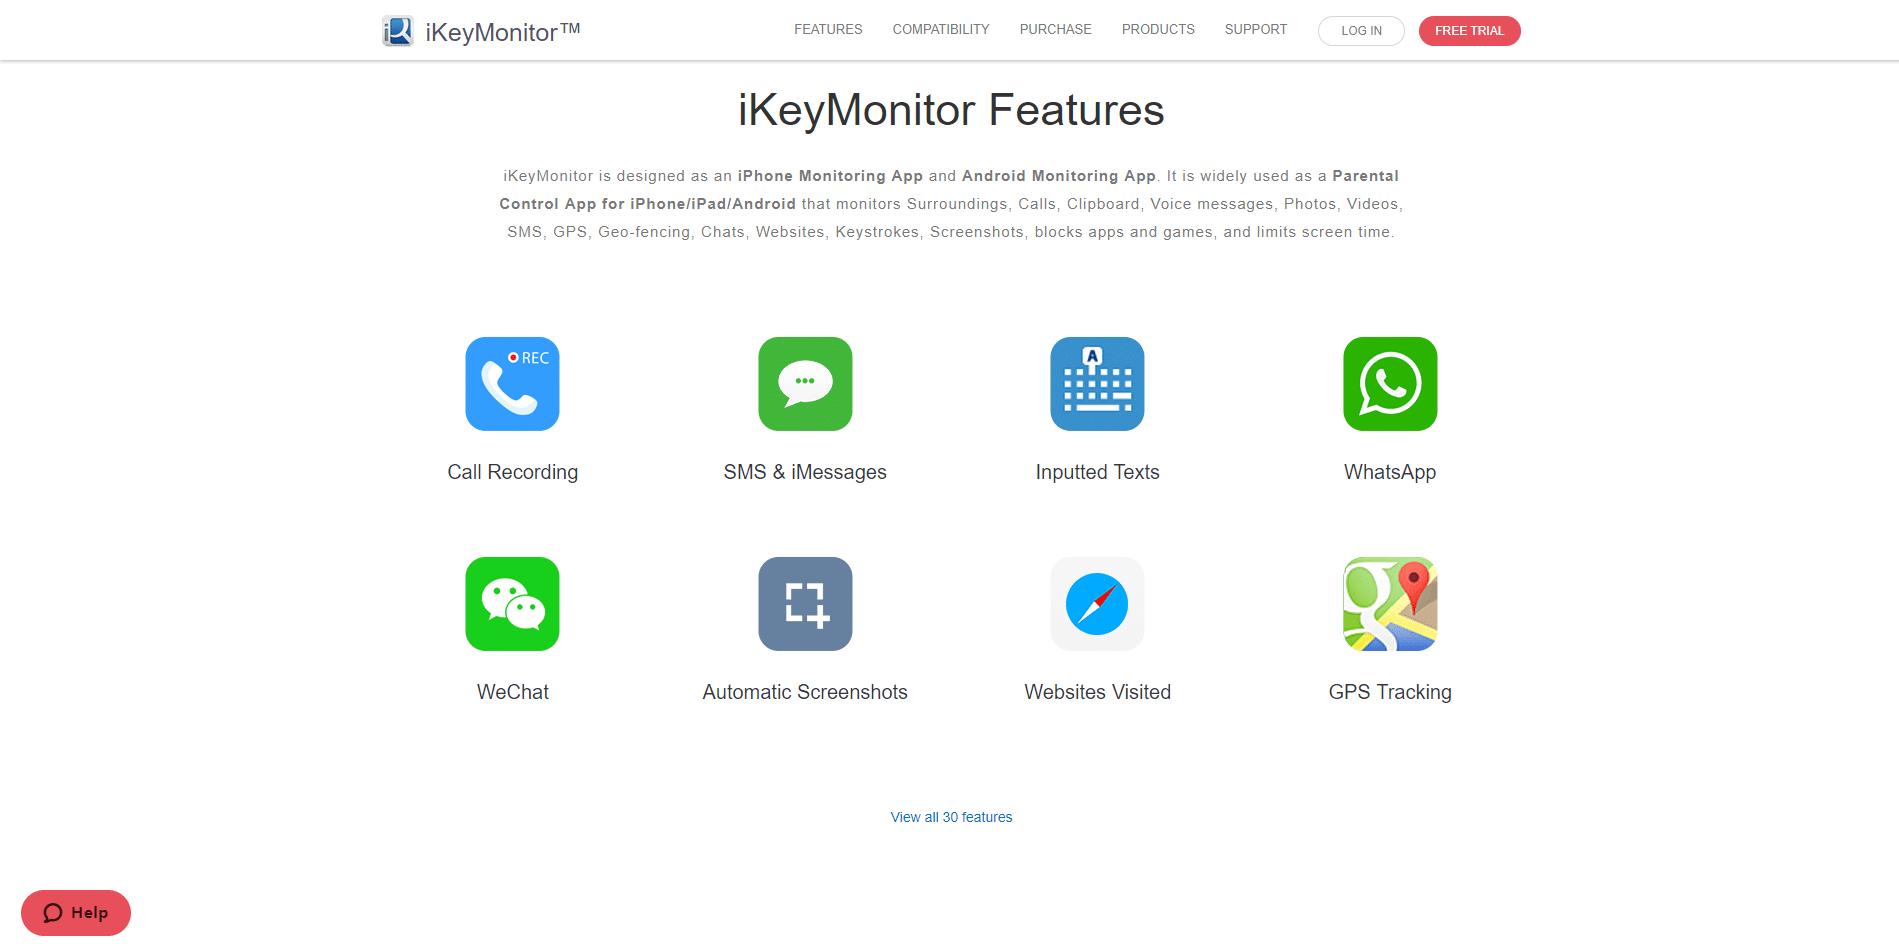 iKeyMonitor features